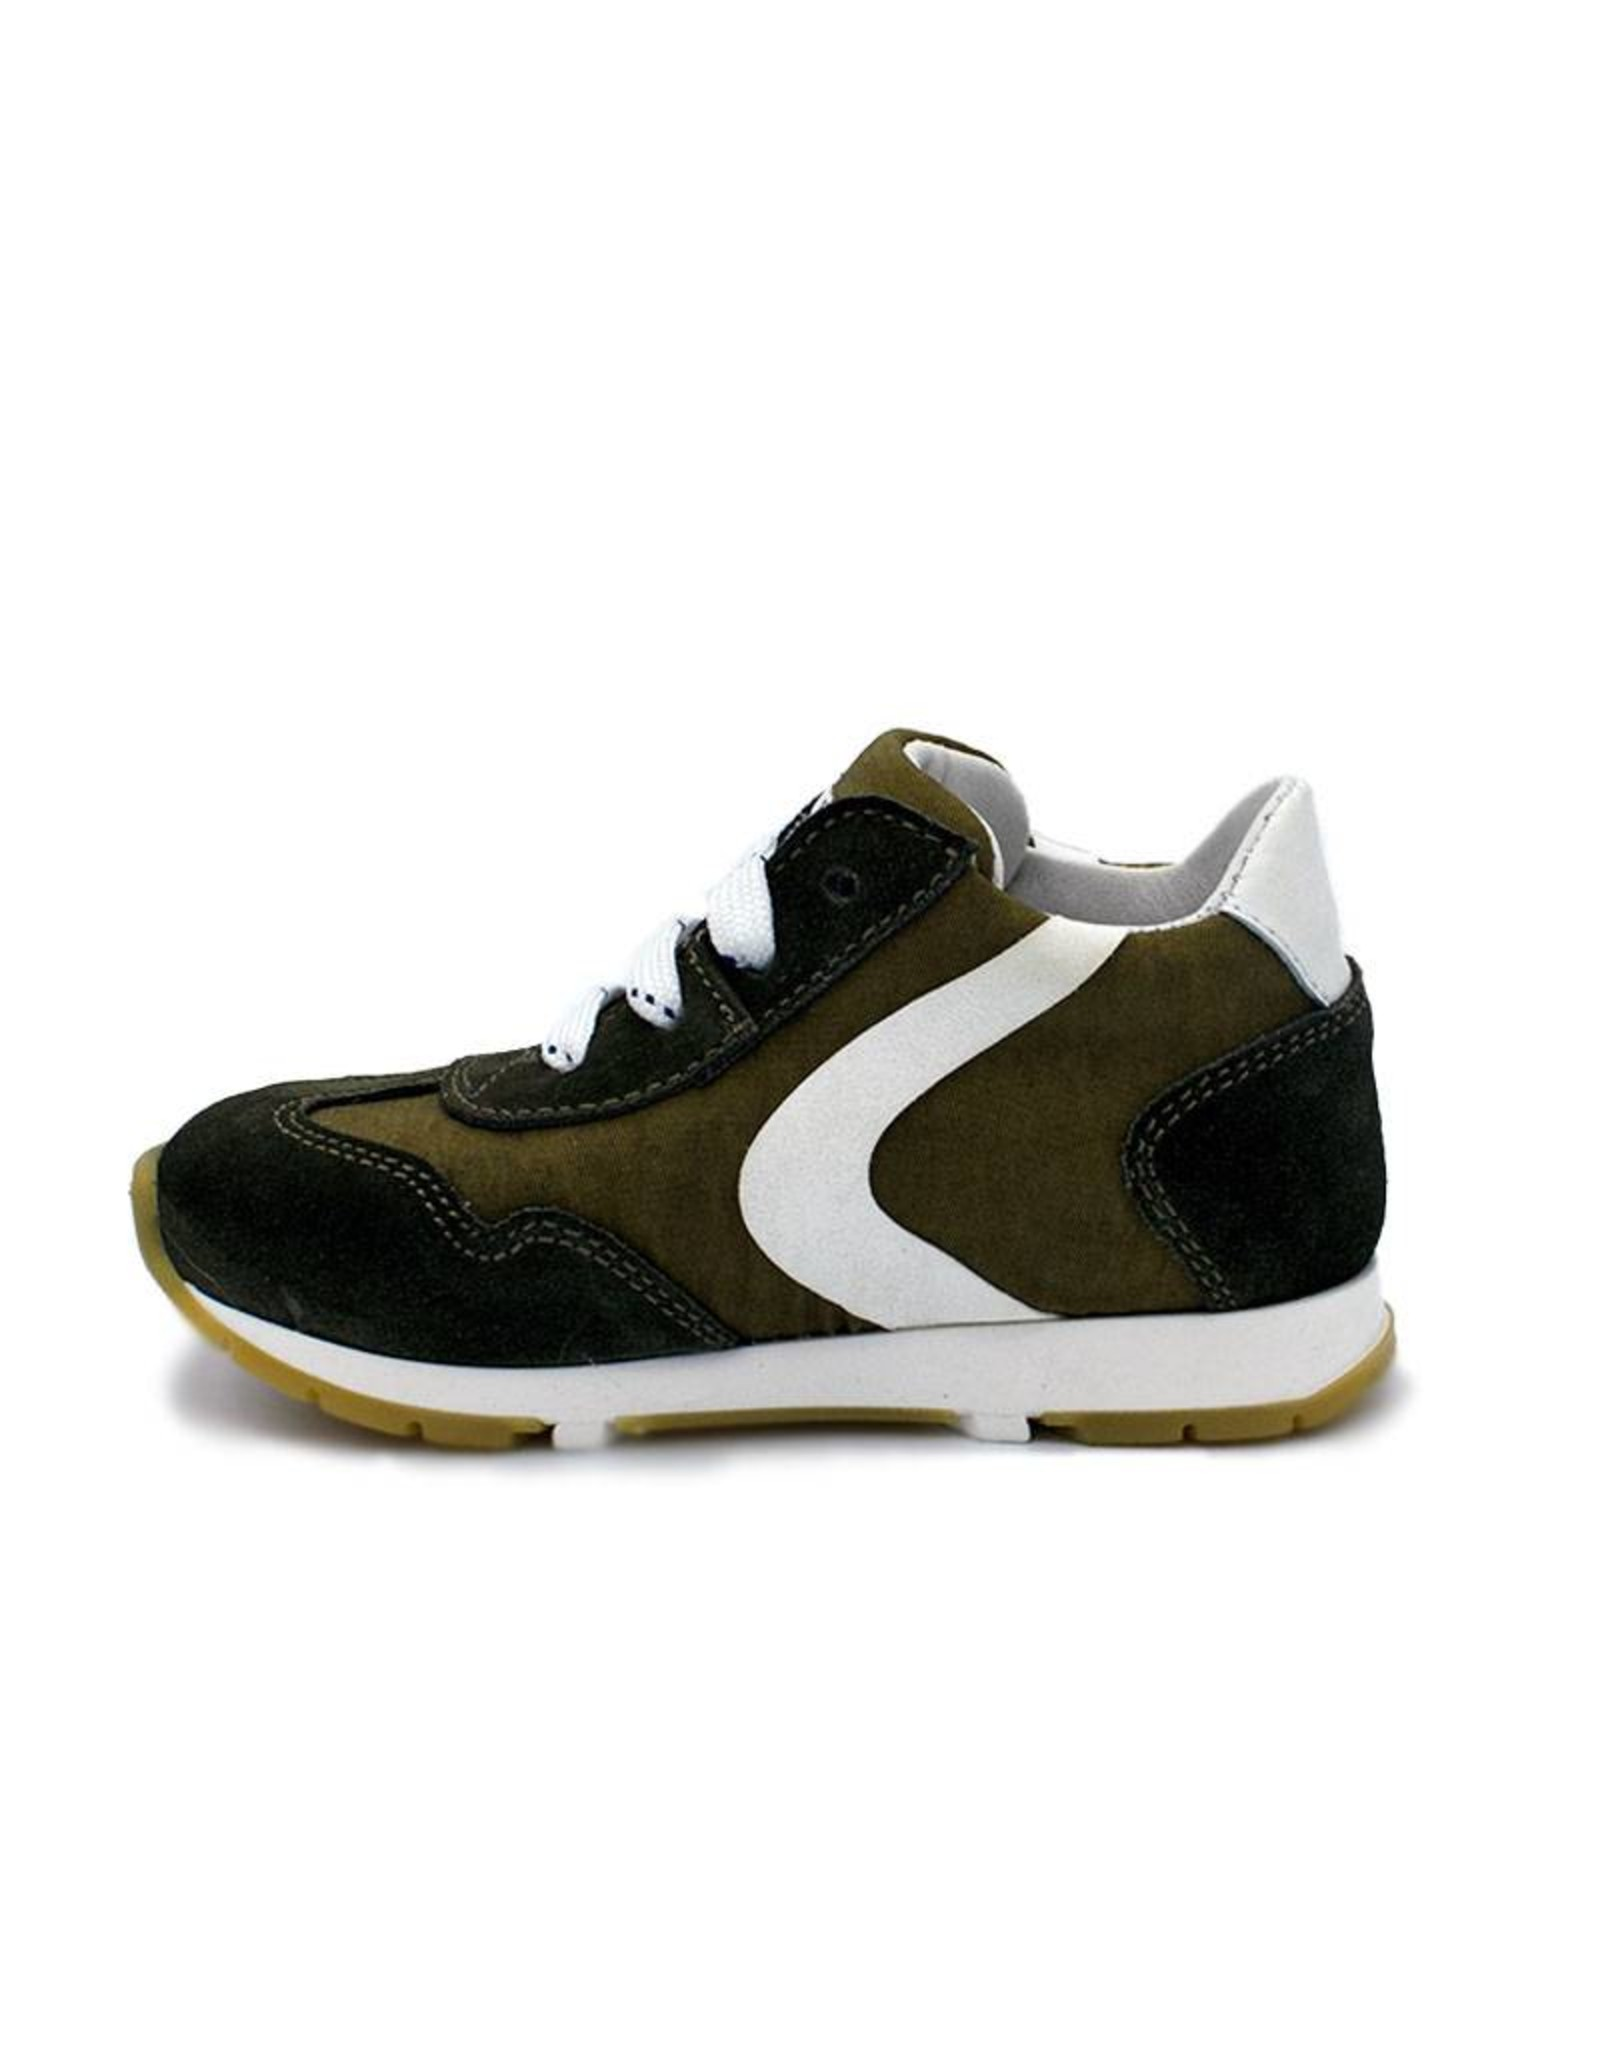 RONDINELLA RONDINELLA sneaker groen